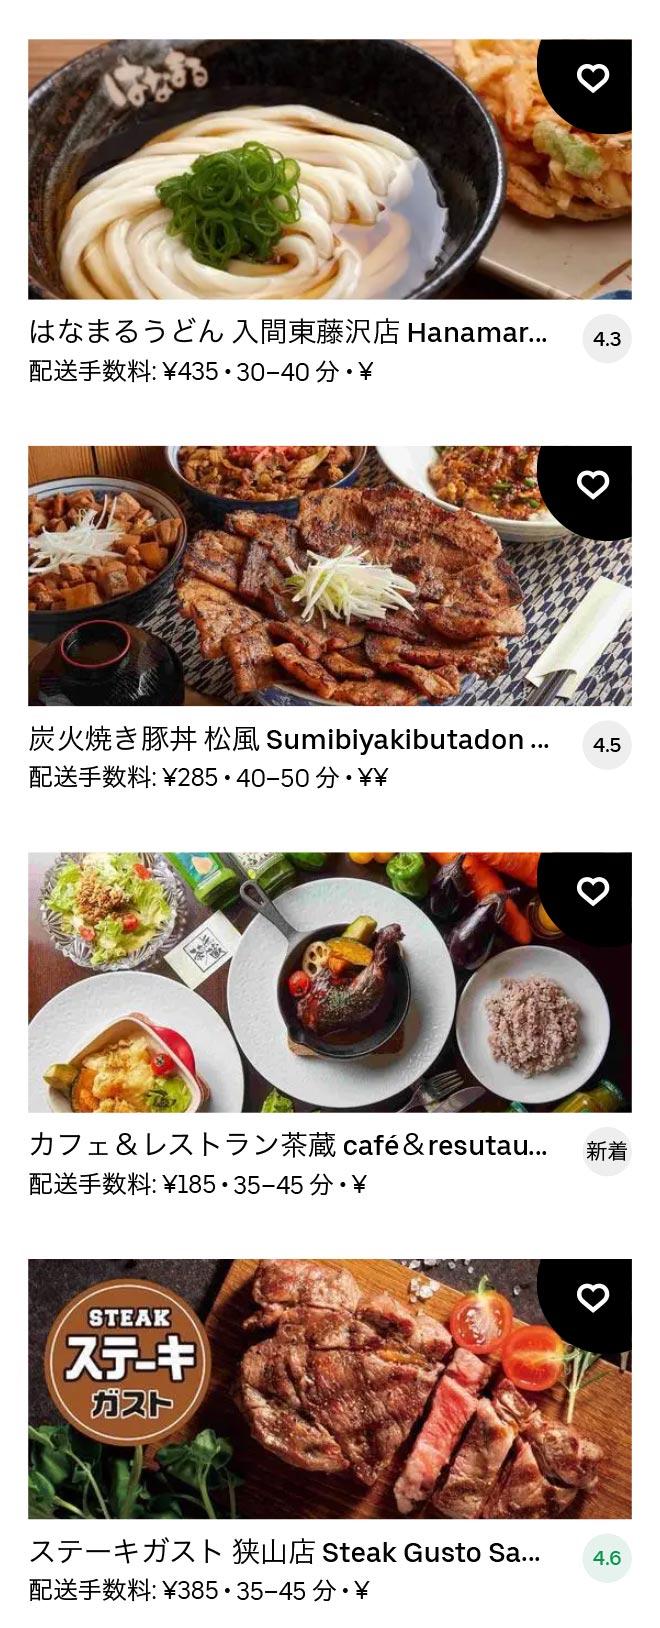 Iruma menu 2101 04